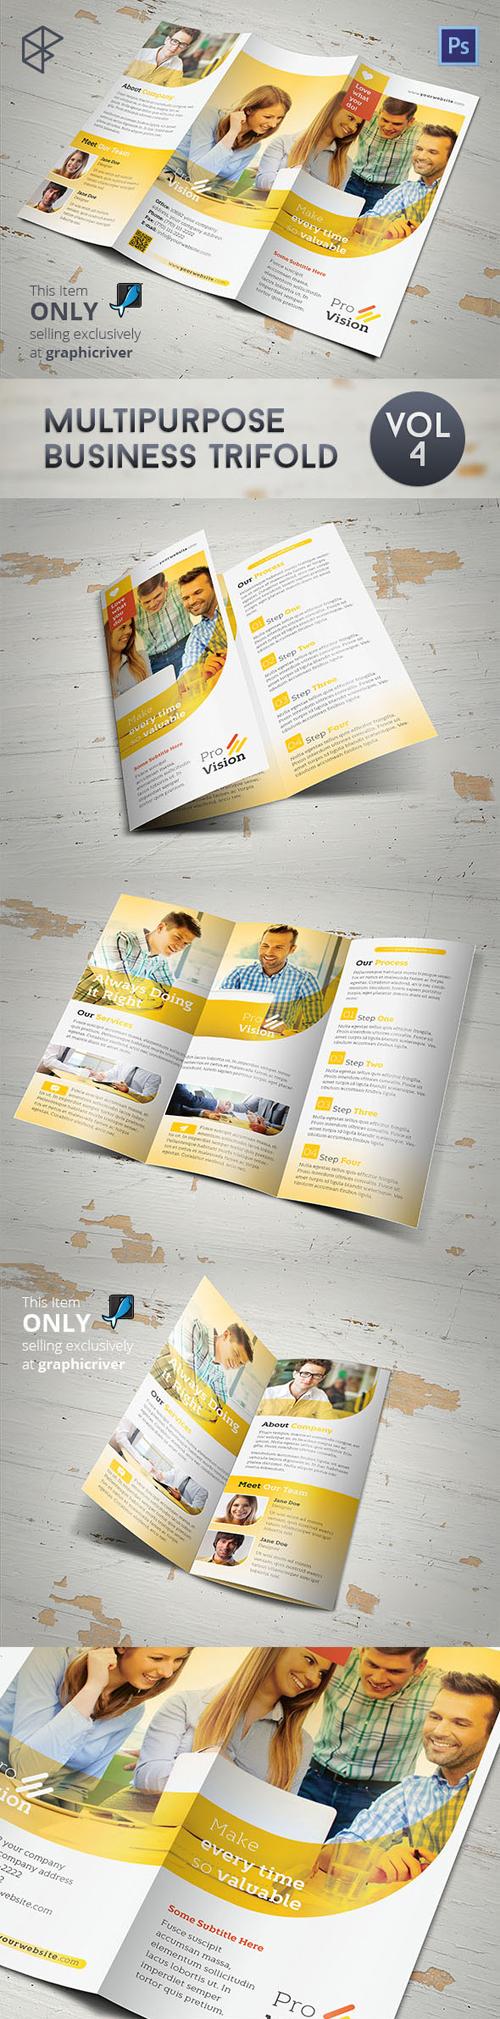 Multipurpose Business Trifold Brochure Design